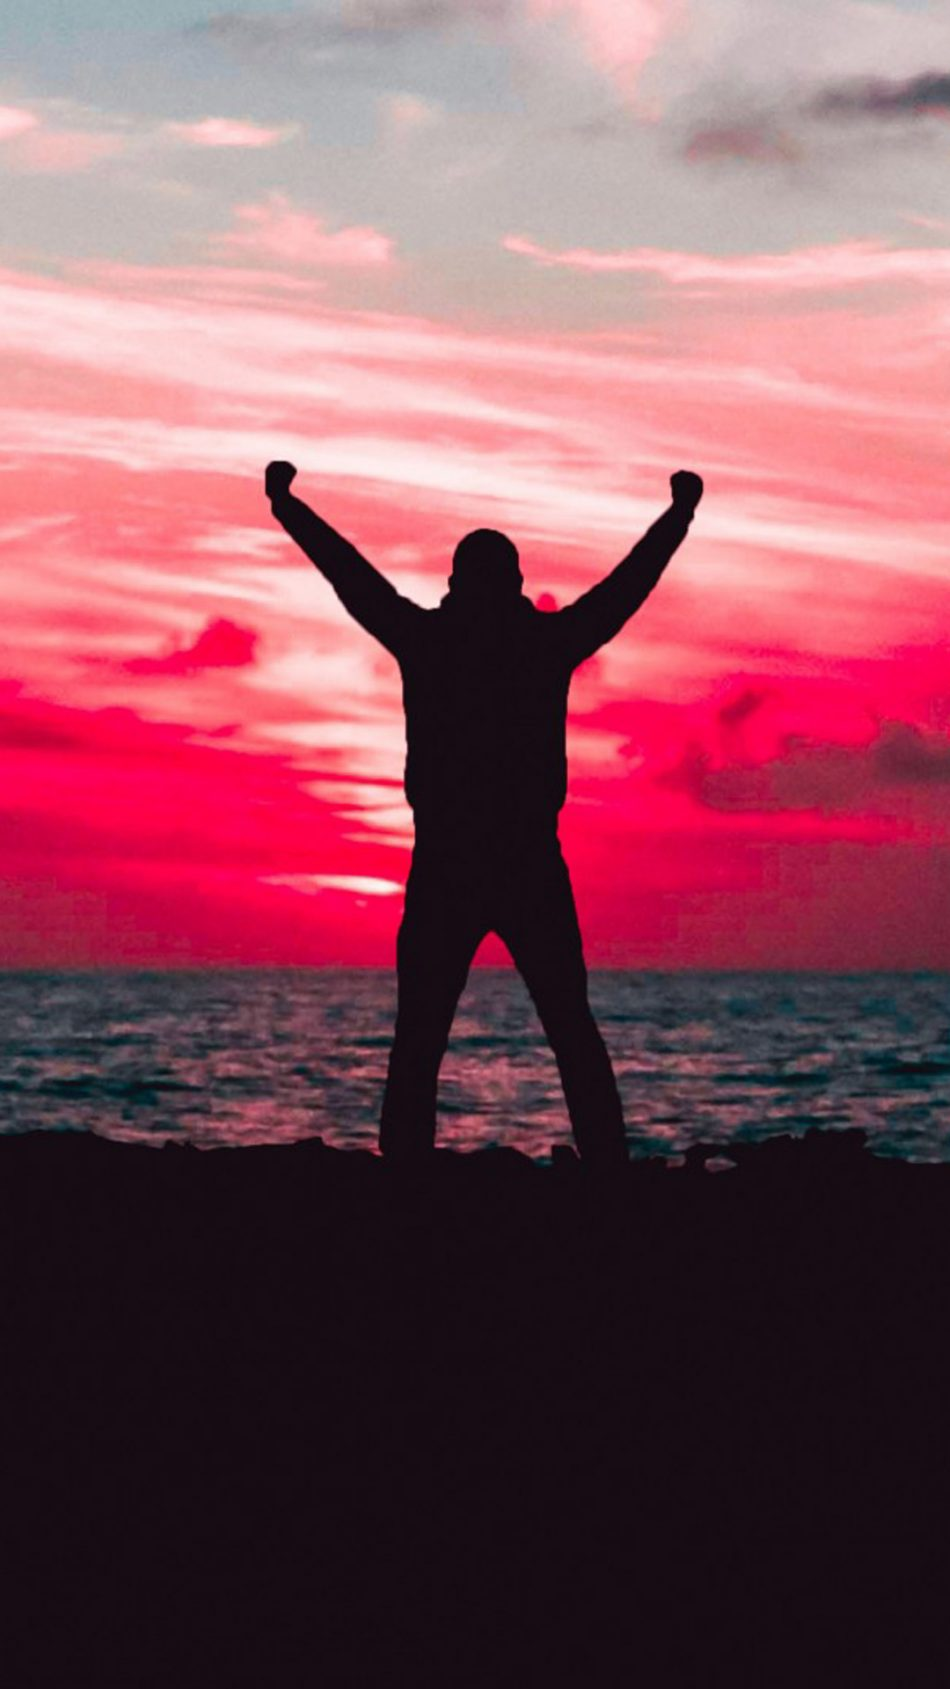 Silhouette Man Sunset Beach HD Mobile Wallpaper